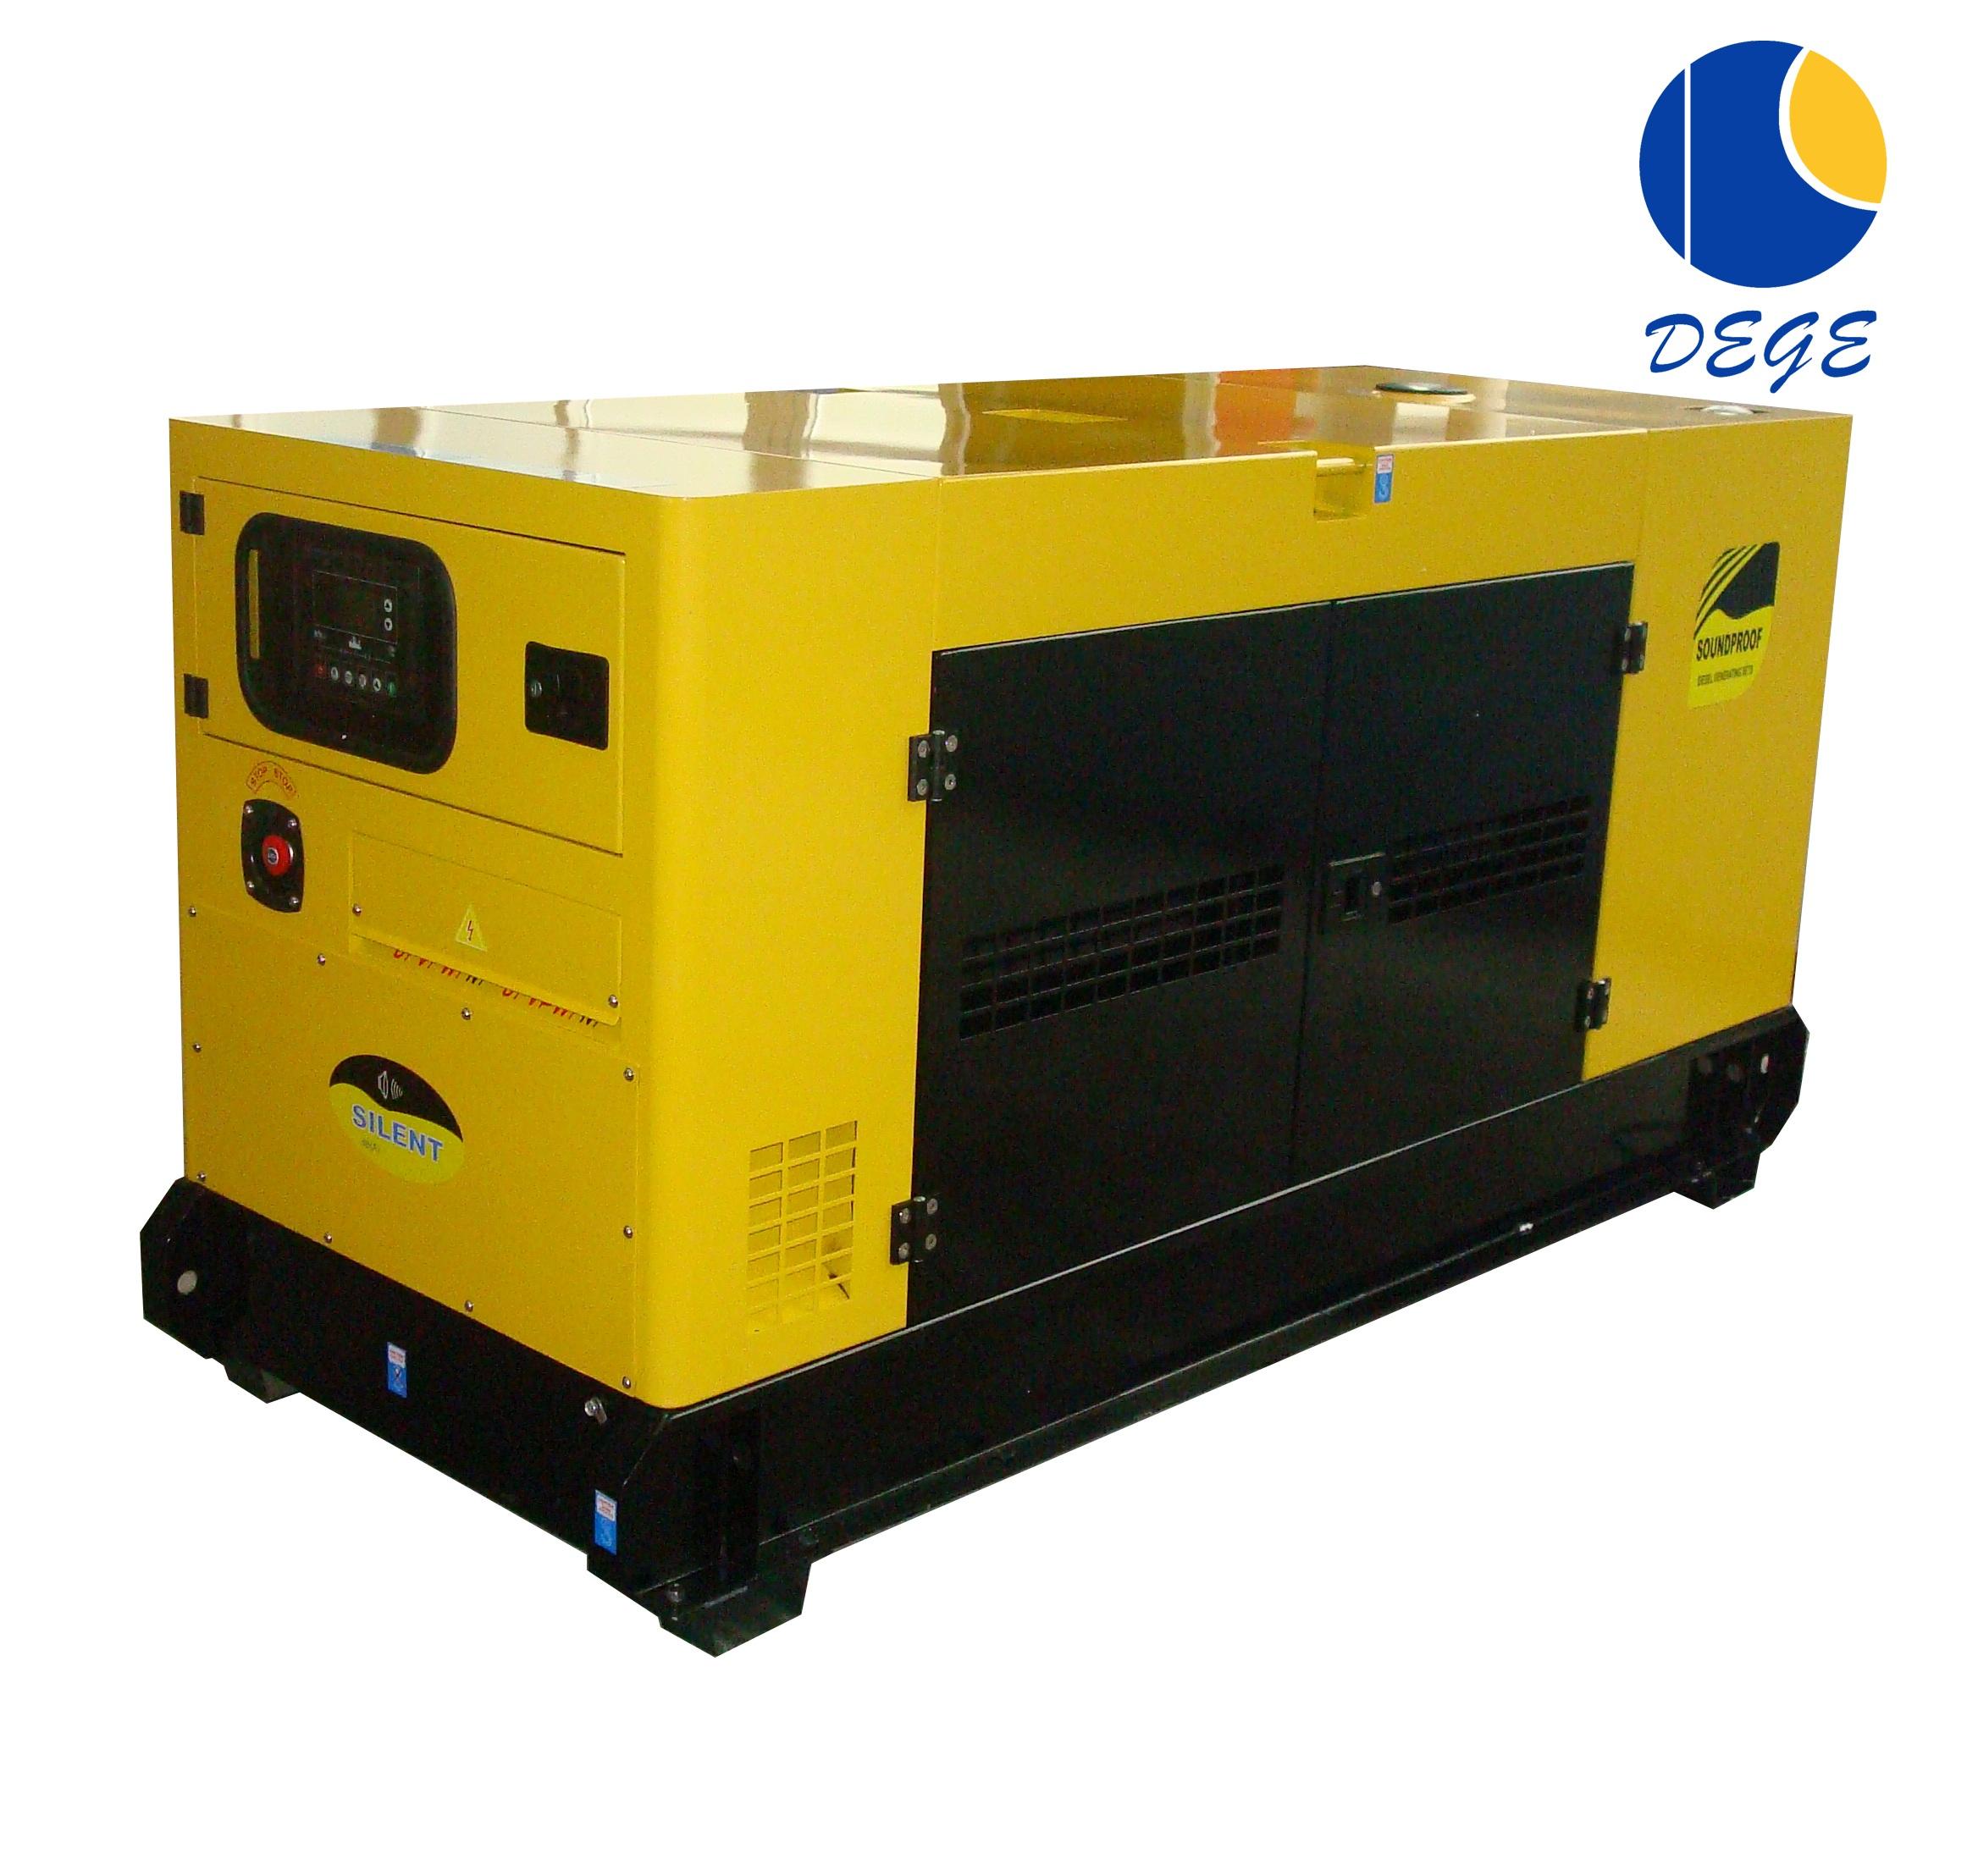 China 30kw Diesel Generator China 30kw Diesel Generator